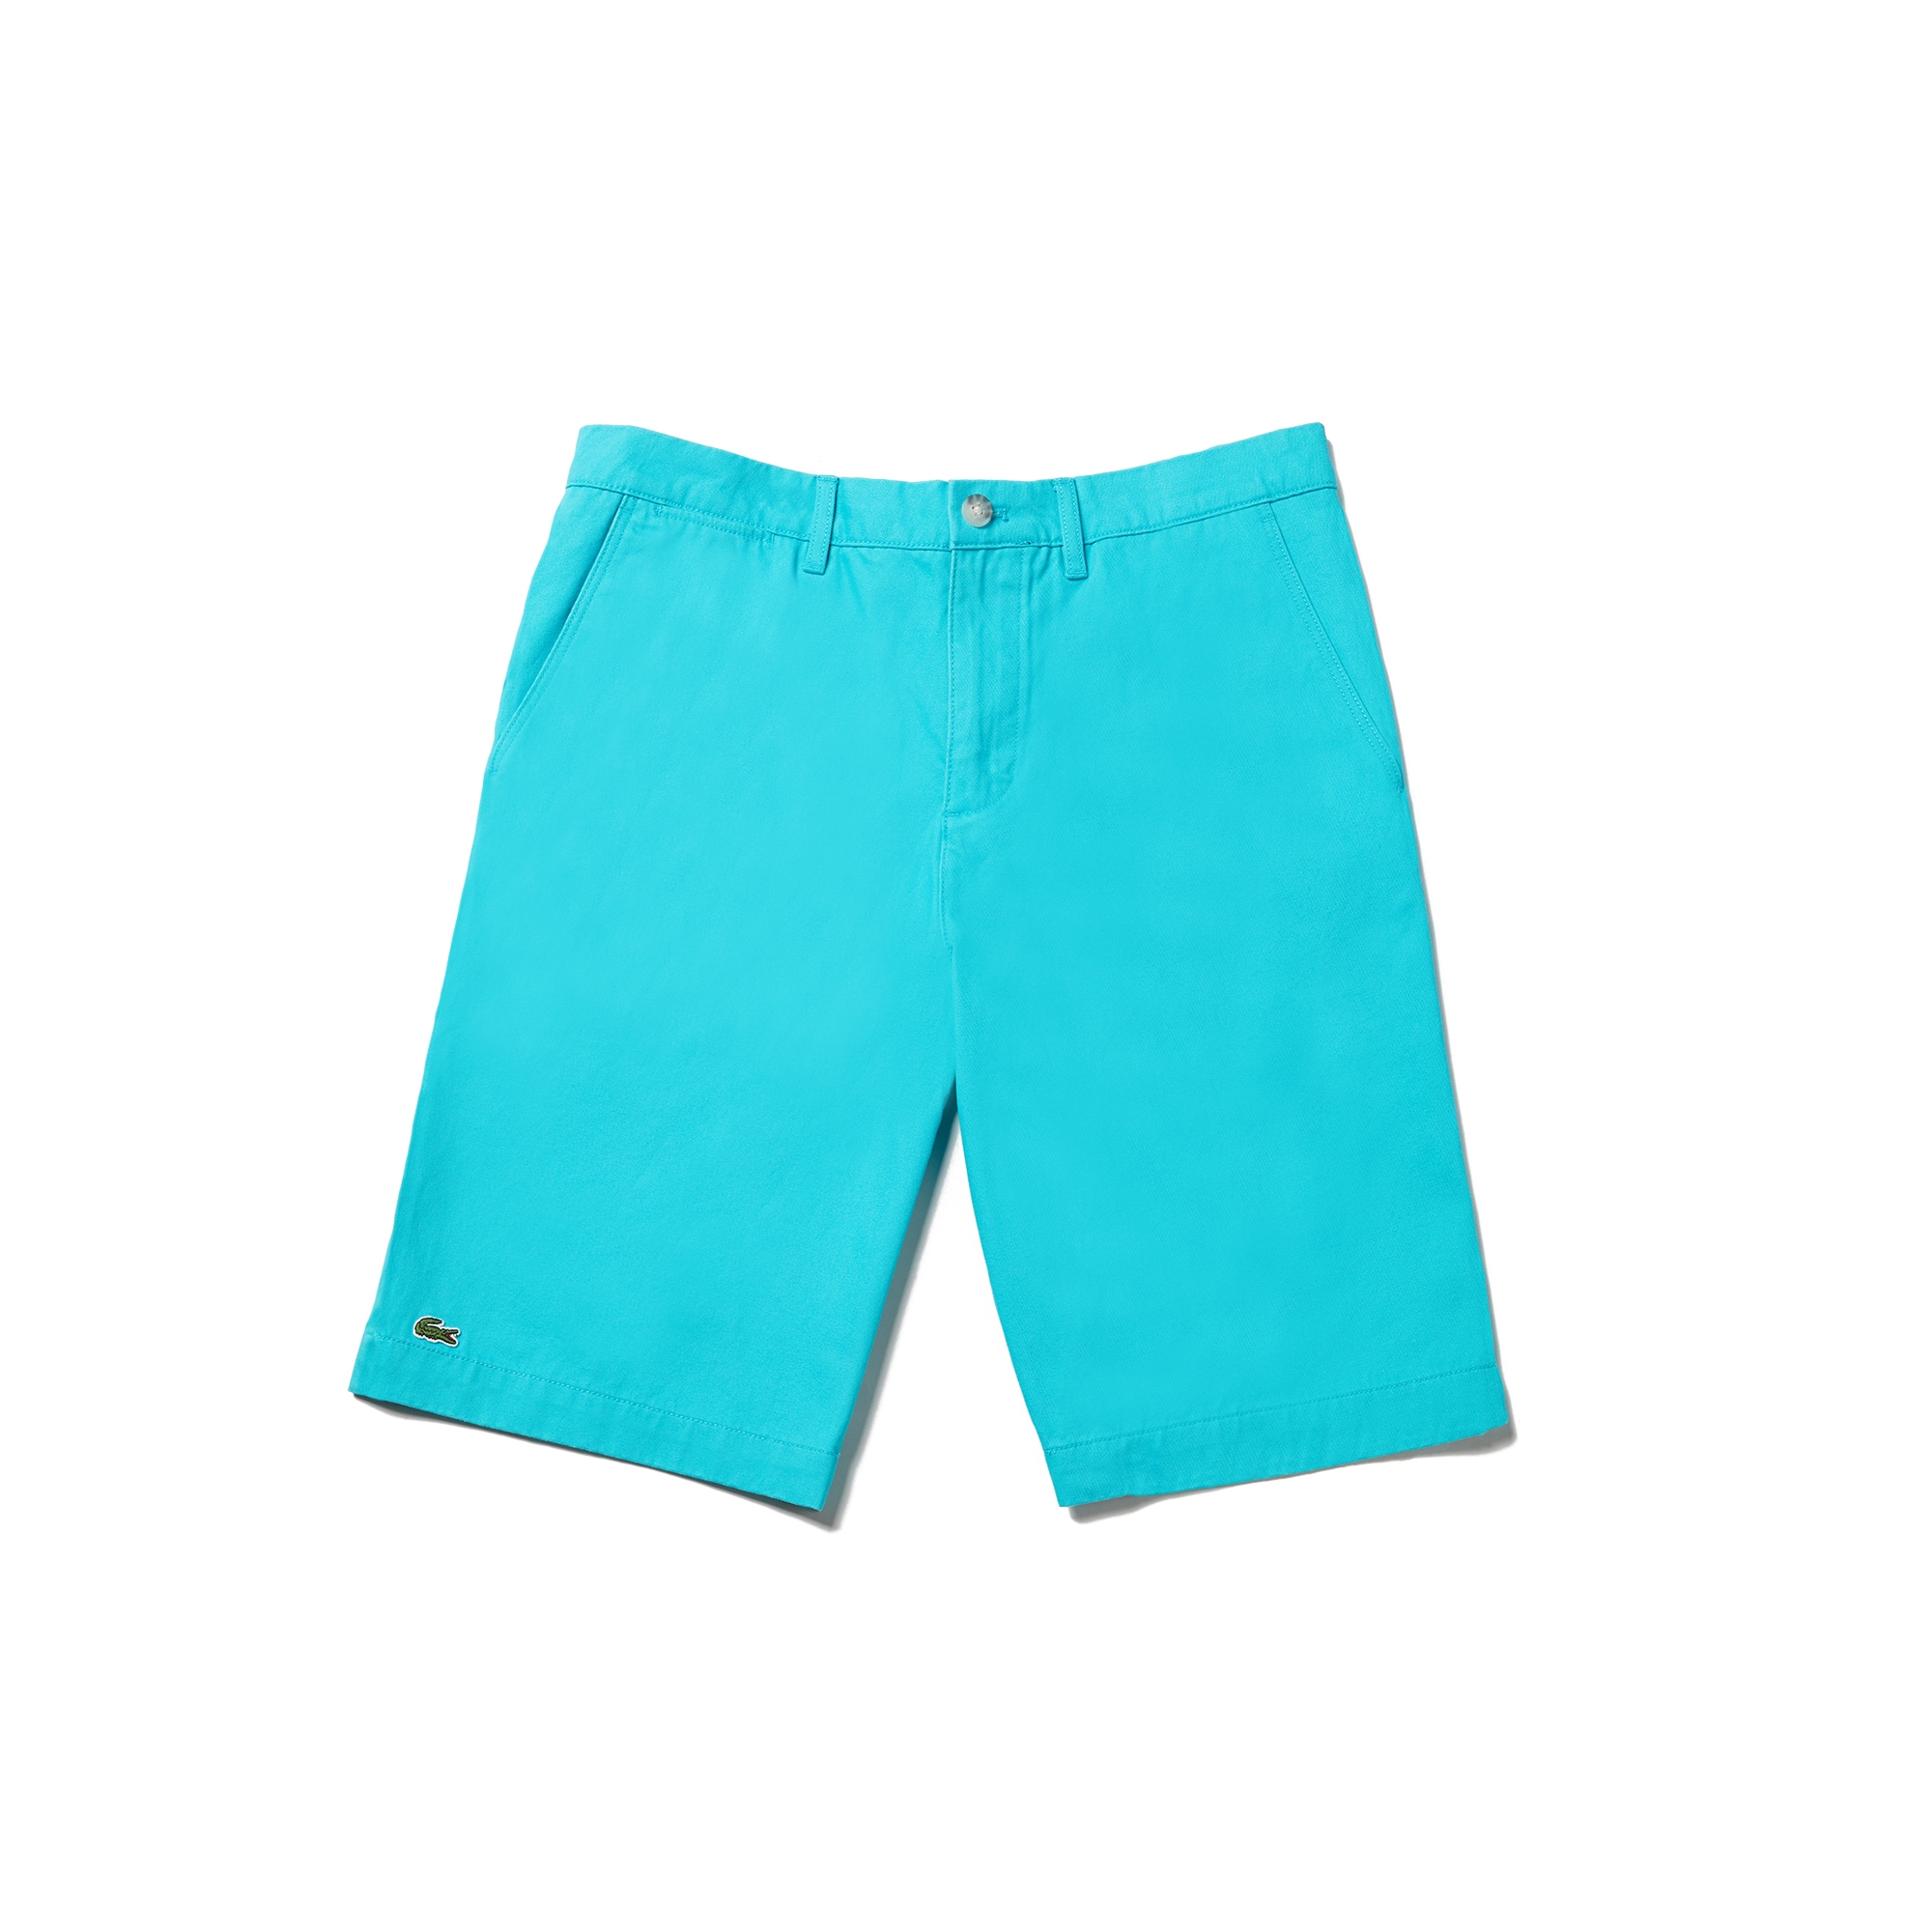 Men's Regular Fit Bermuda Shorts